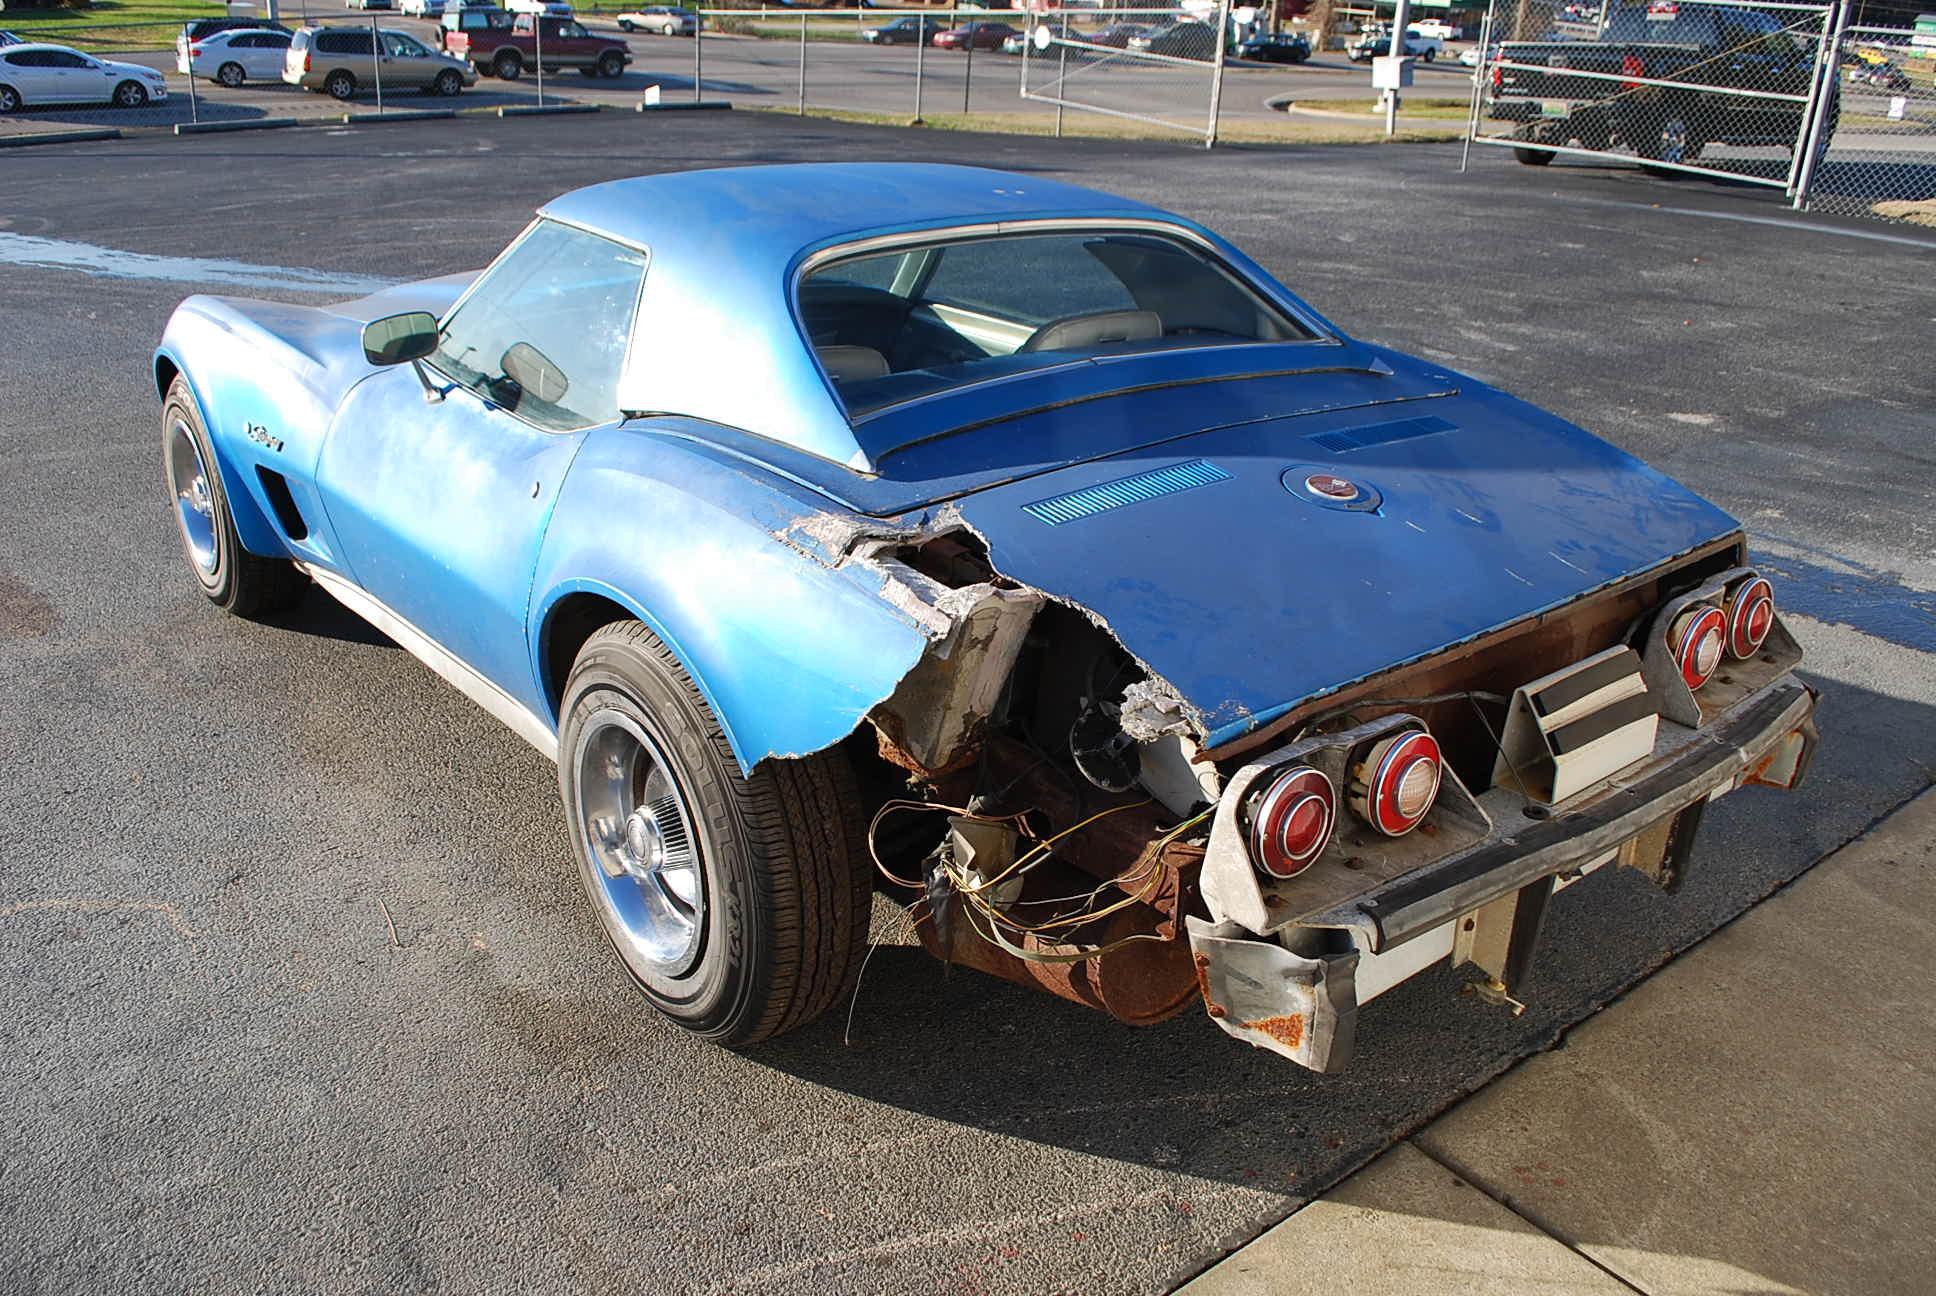 1975 Corvette Convertible - Great Project Car (SOLD) | Corvettes for ...